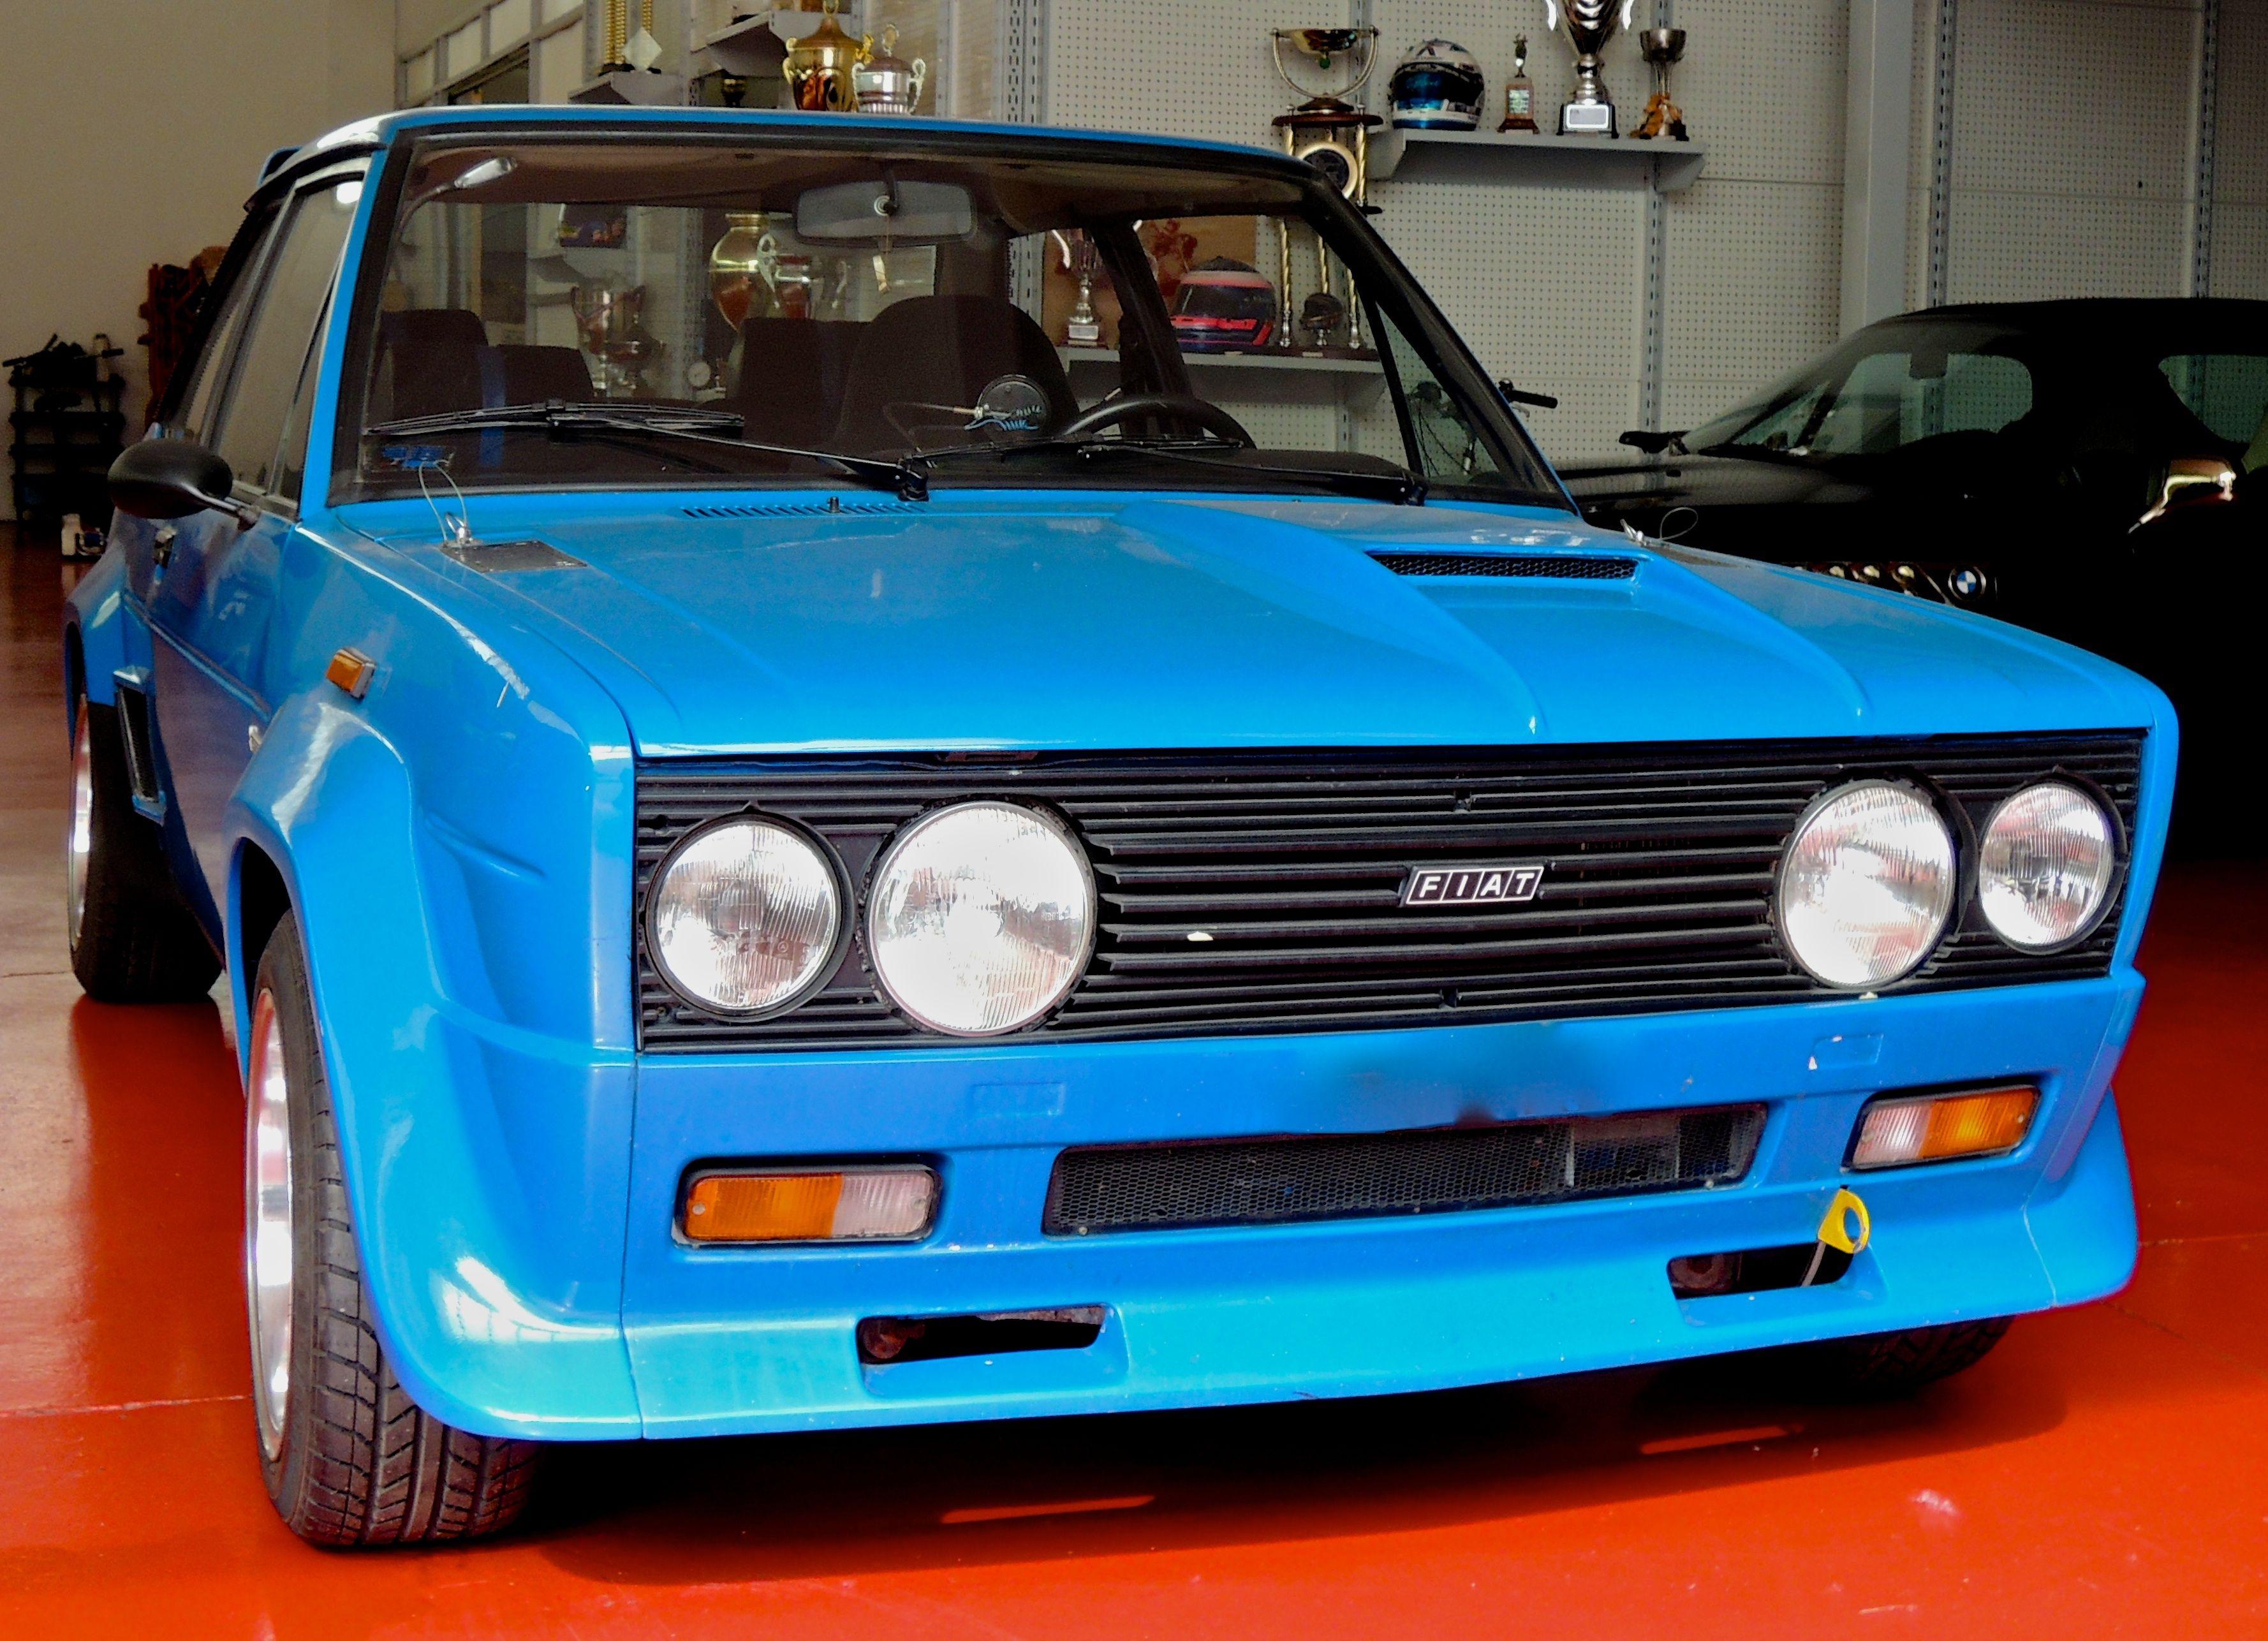 Fiat 131 Abarth Storico